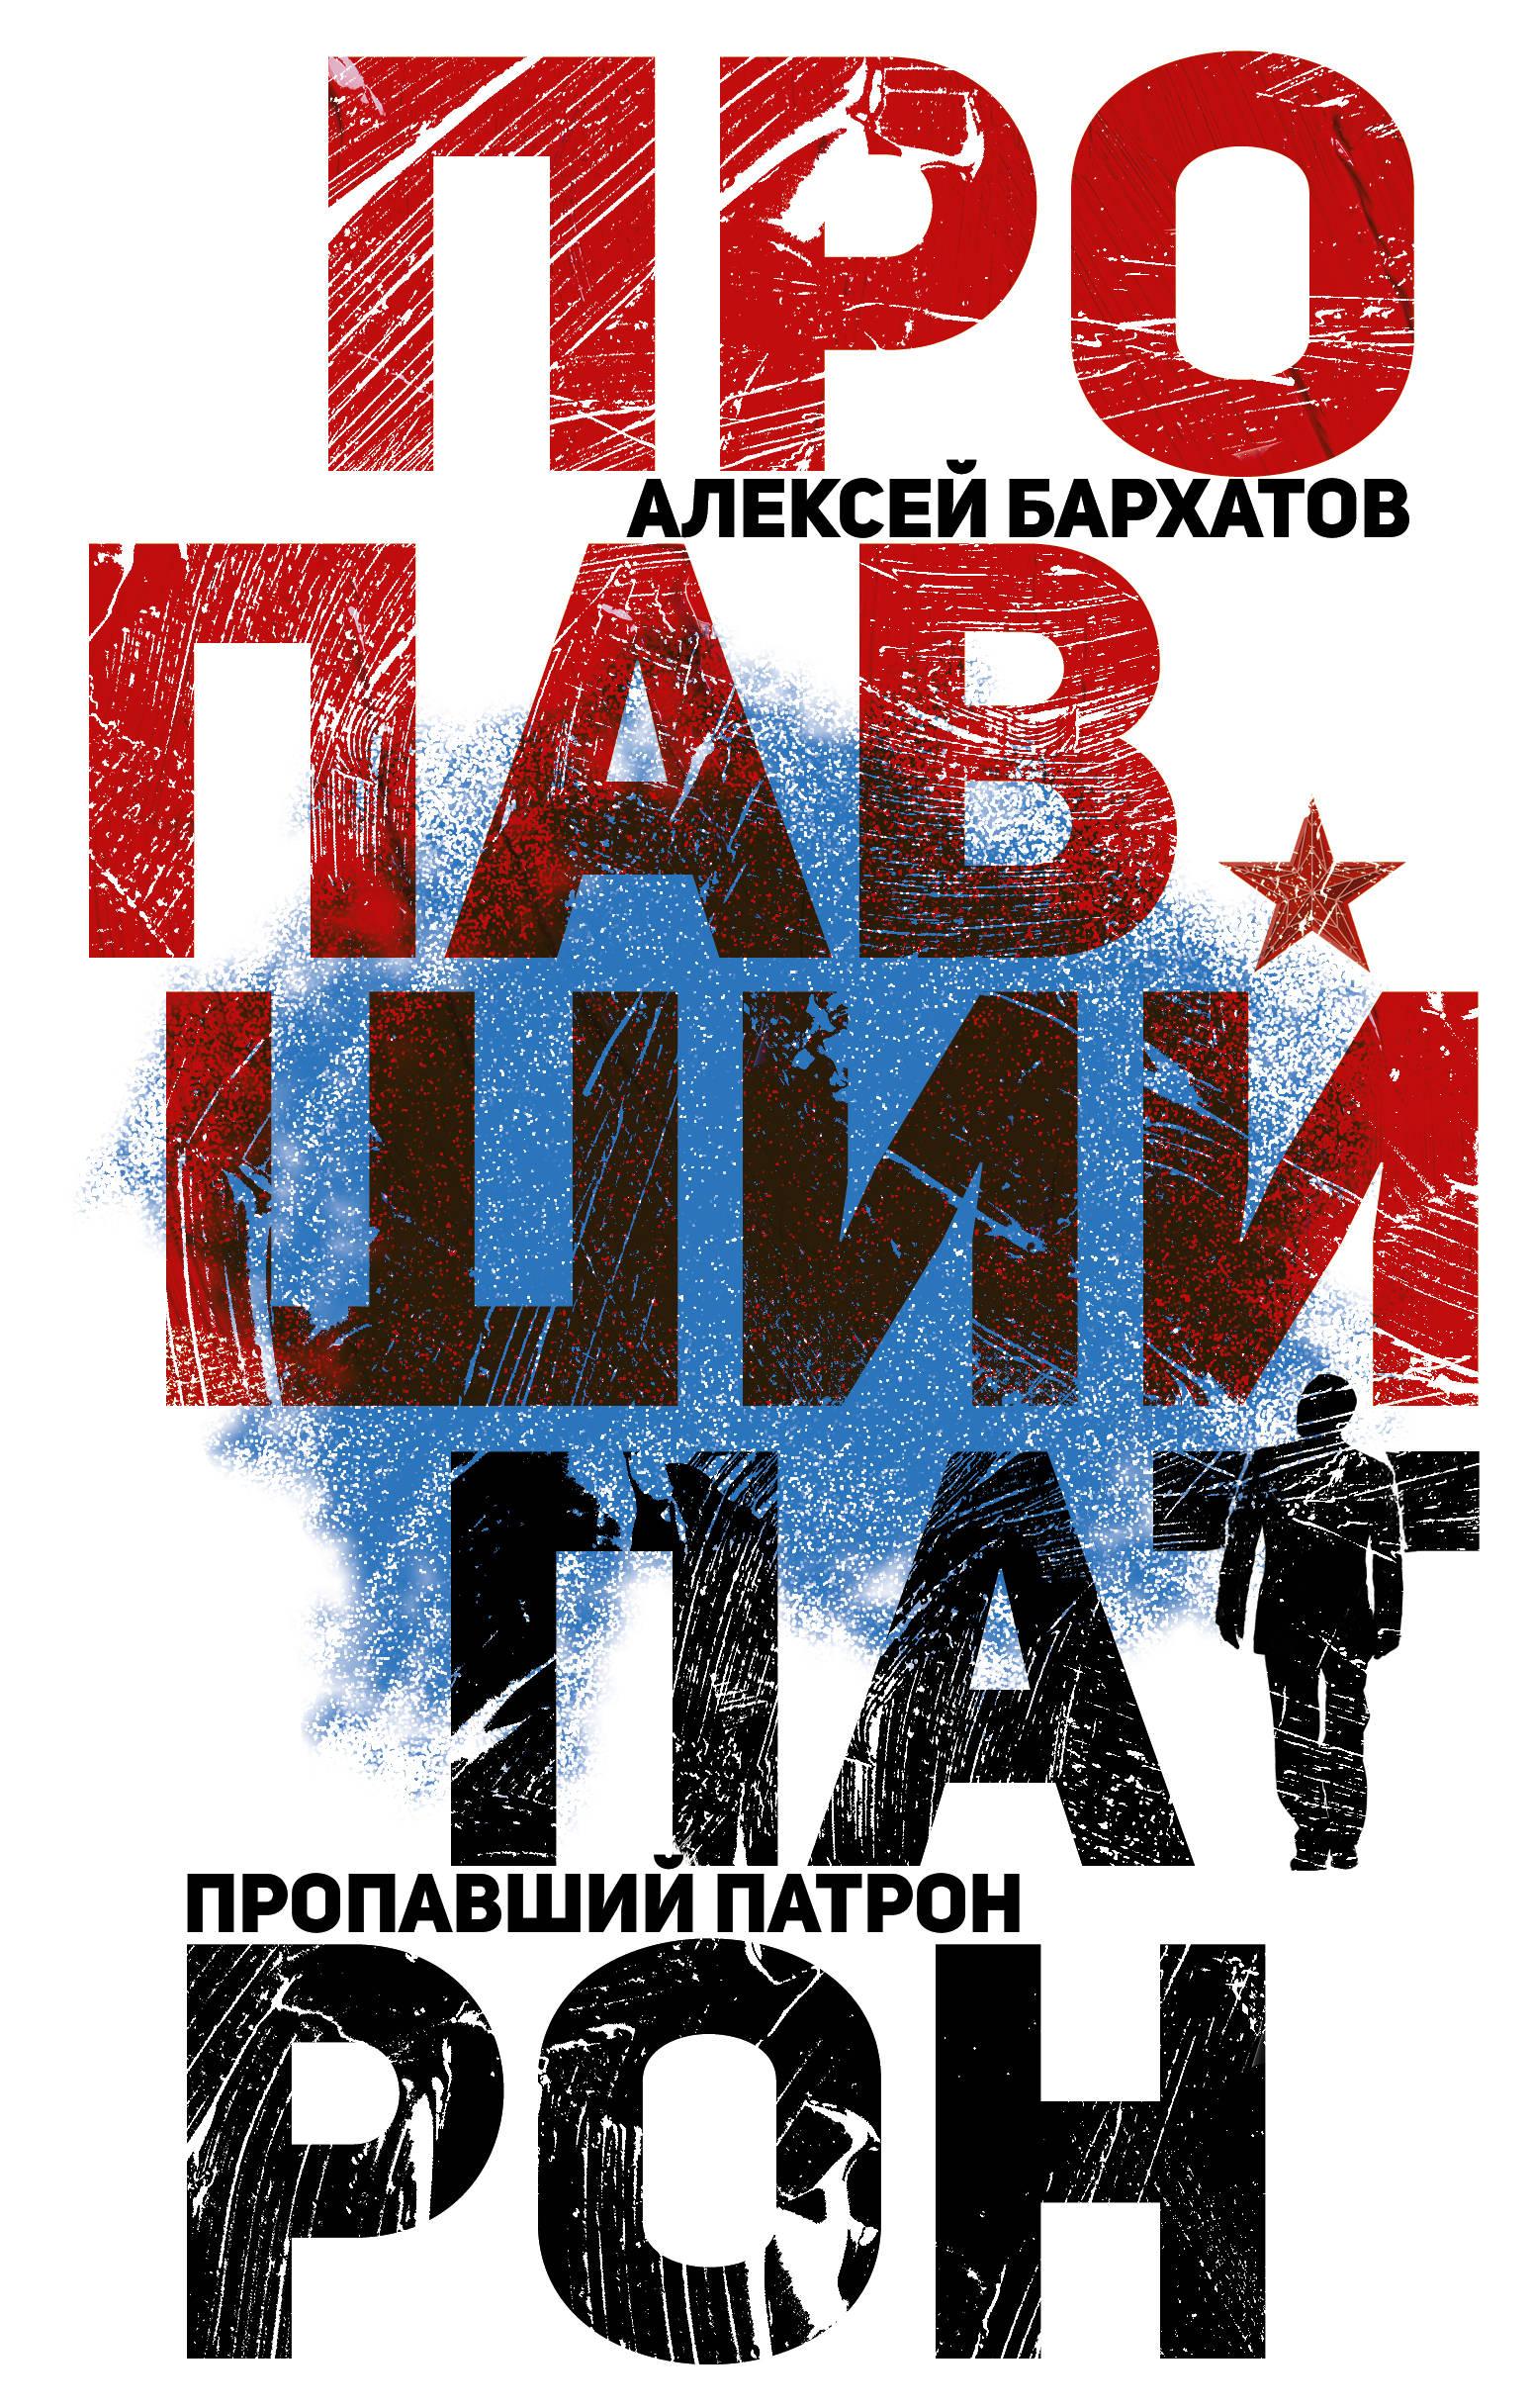 «Пропавший патрон» Алексей Бархатов